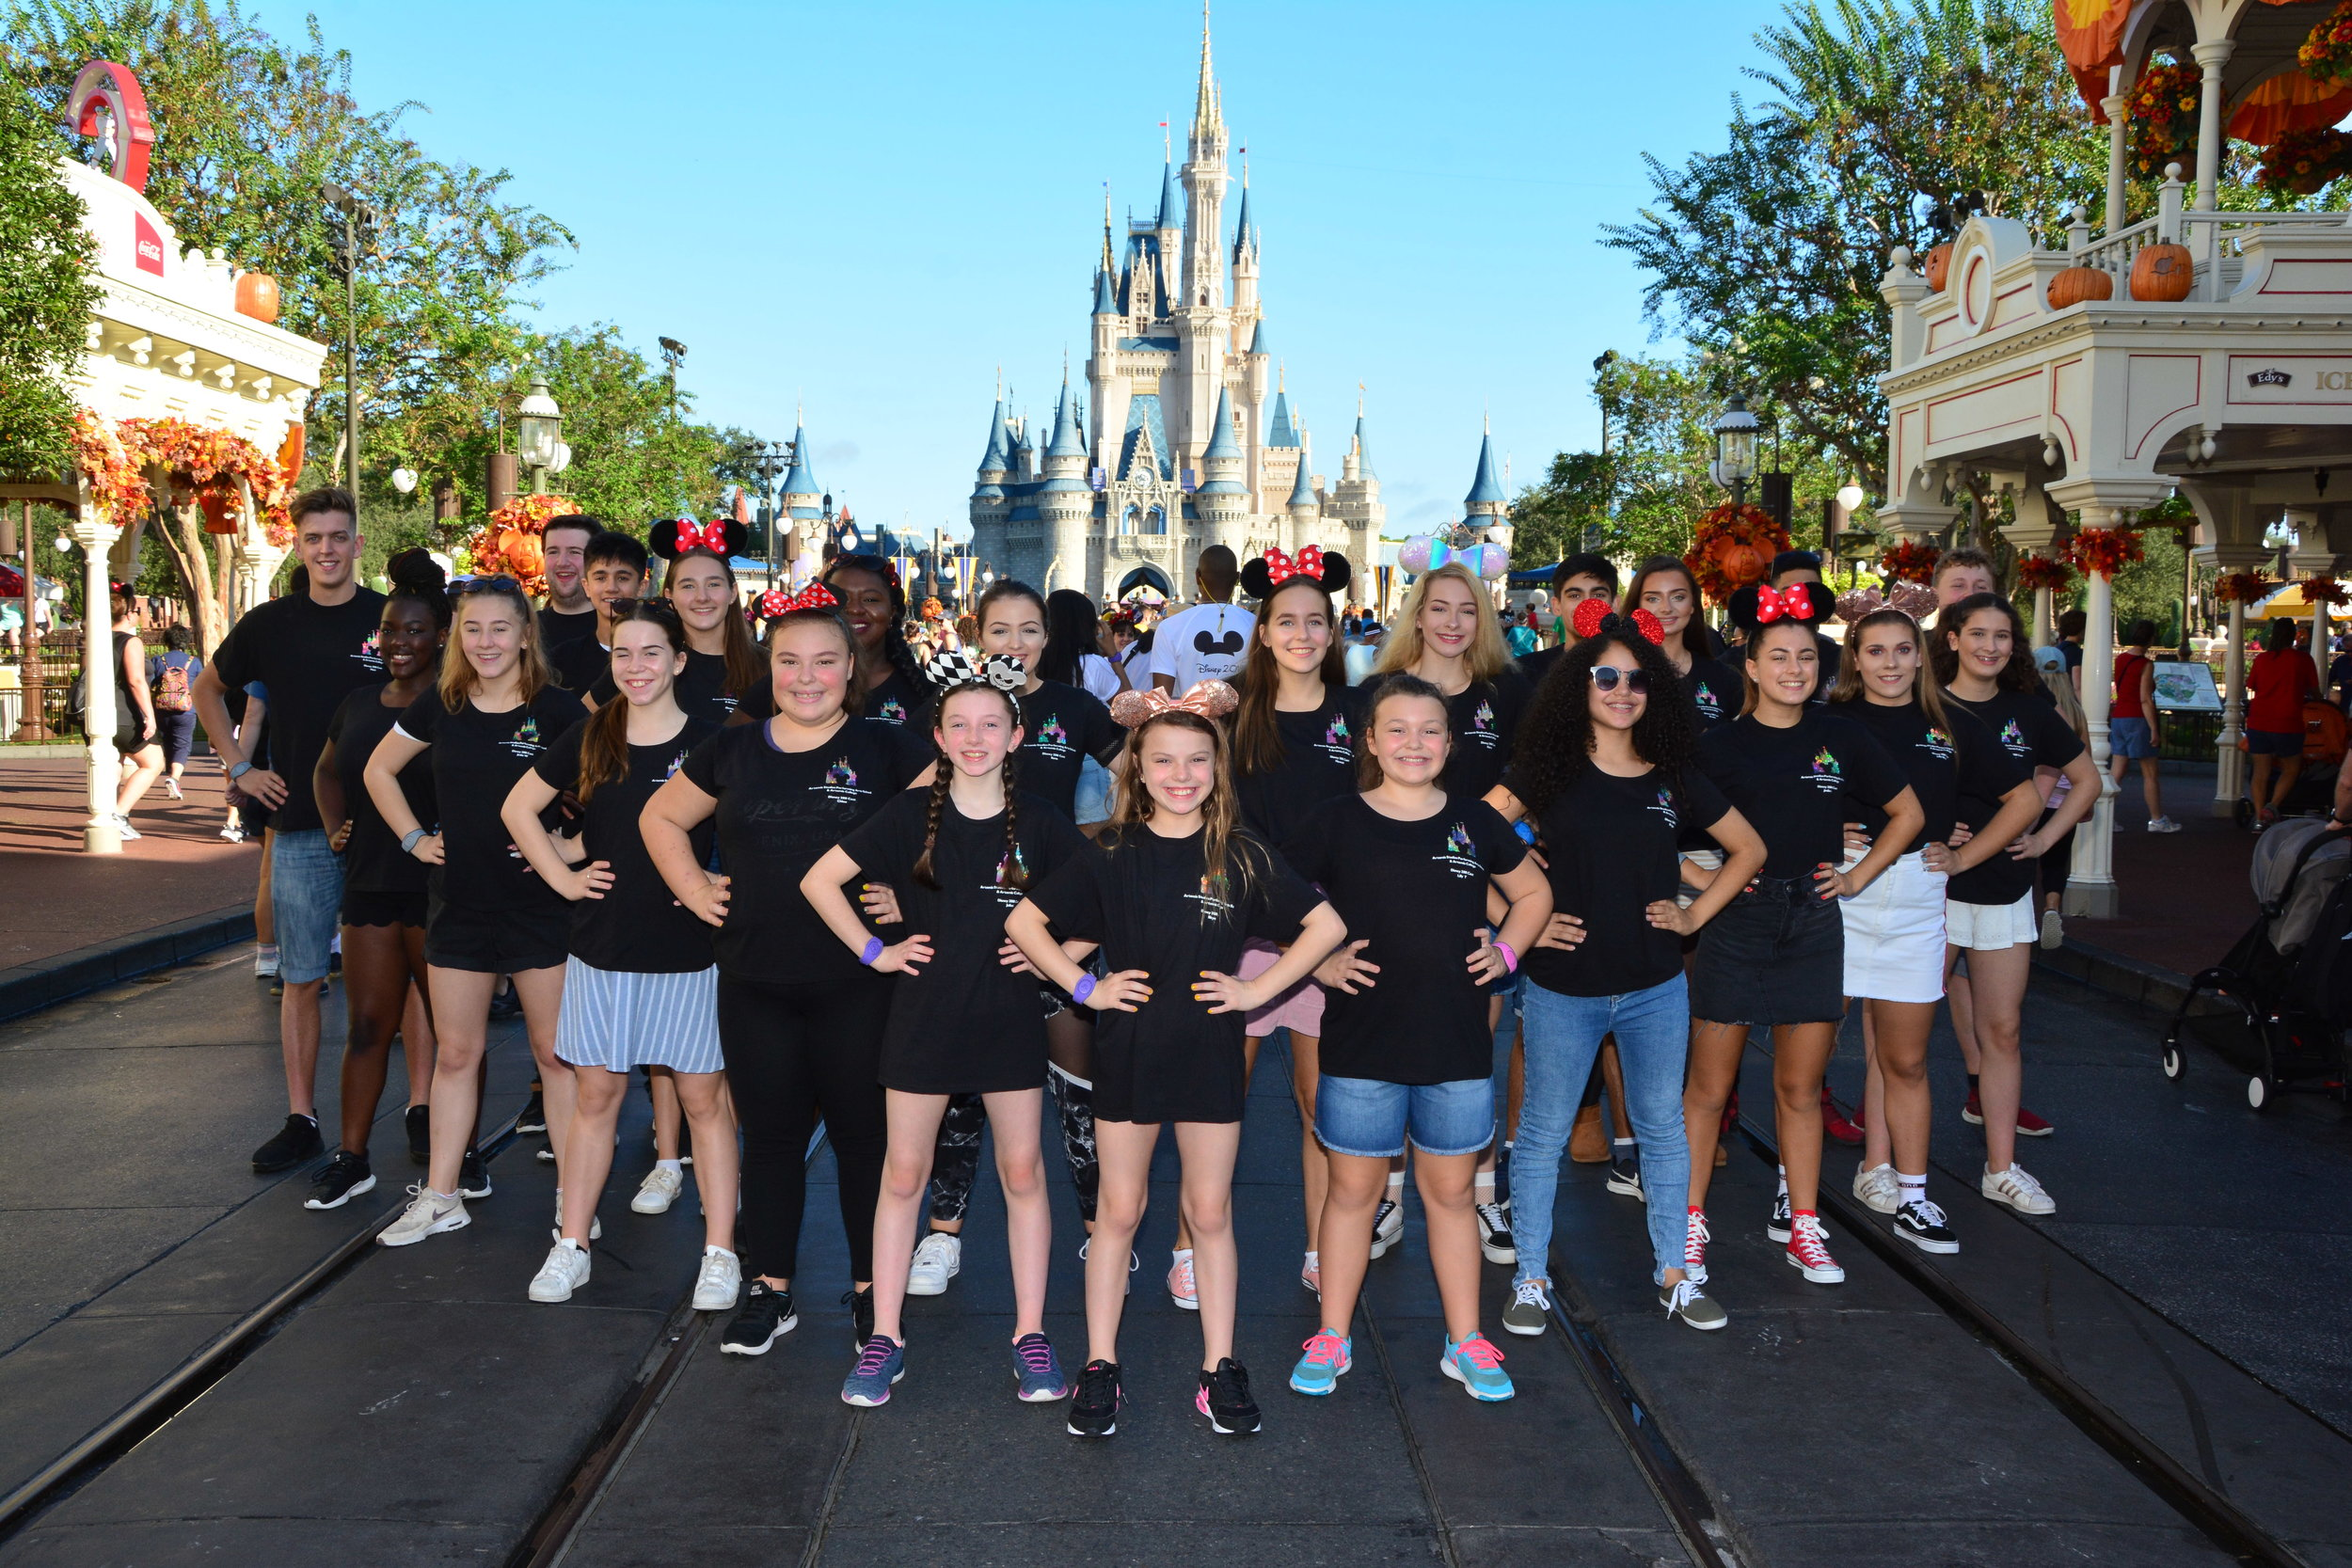 The Artemis Disney 2018 Cast in front of the Magic Castle